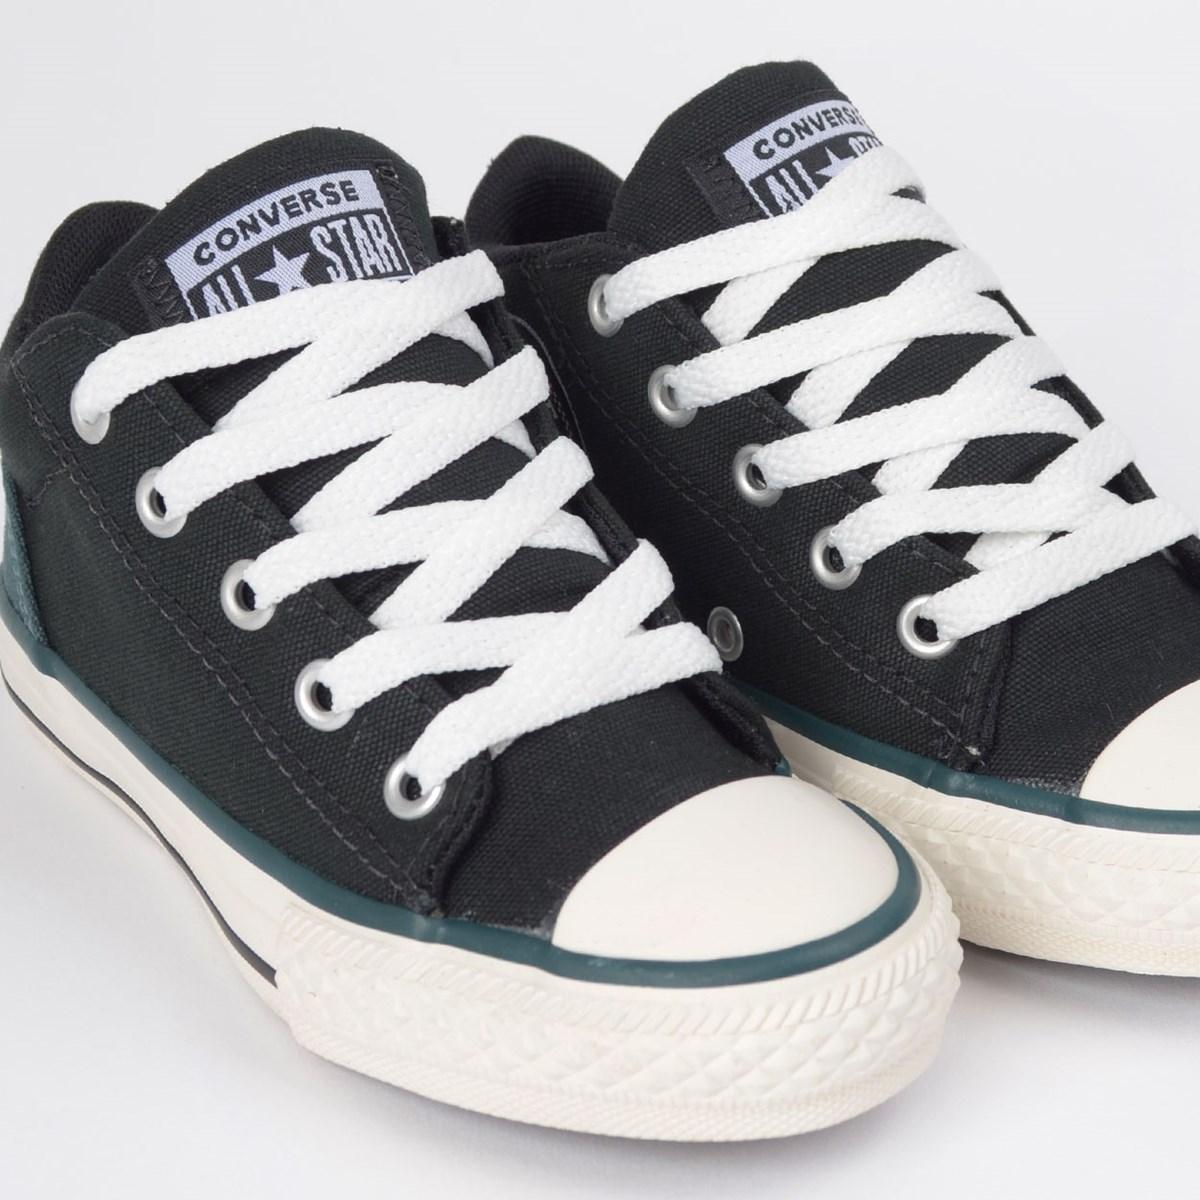 Tênis Converse Chuck Taylor All Star Ollie Kids Preto Verde Escuro CK07960001